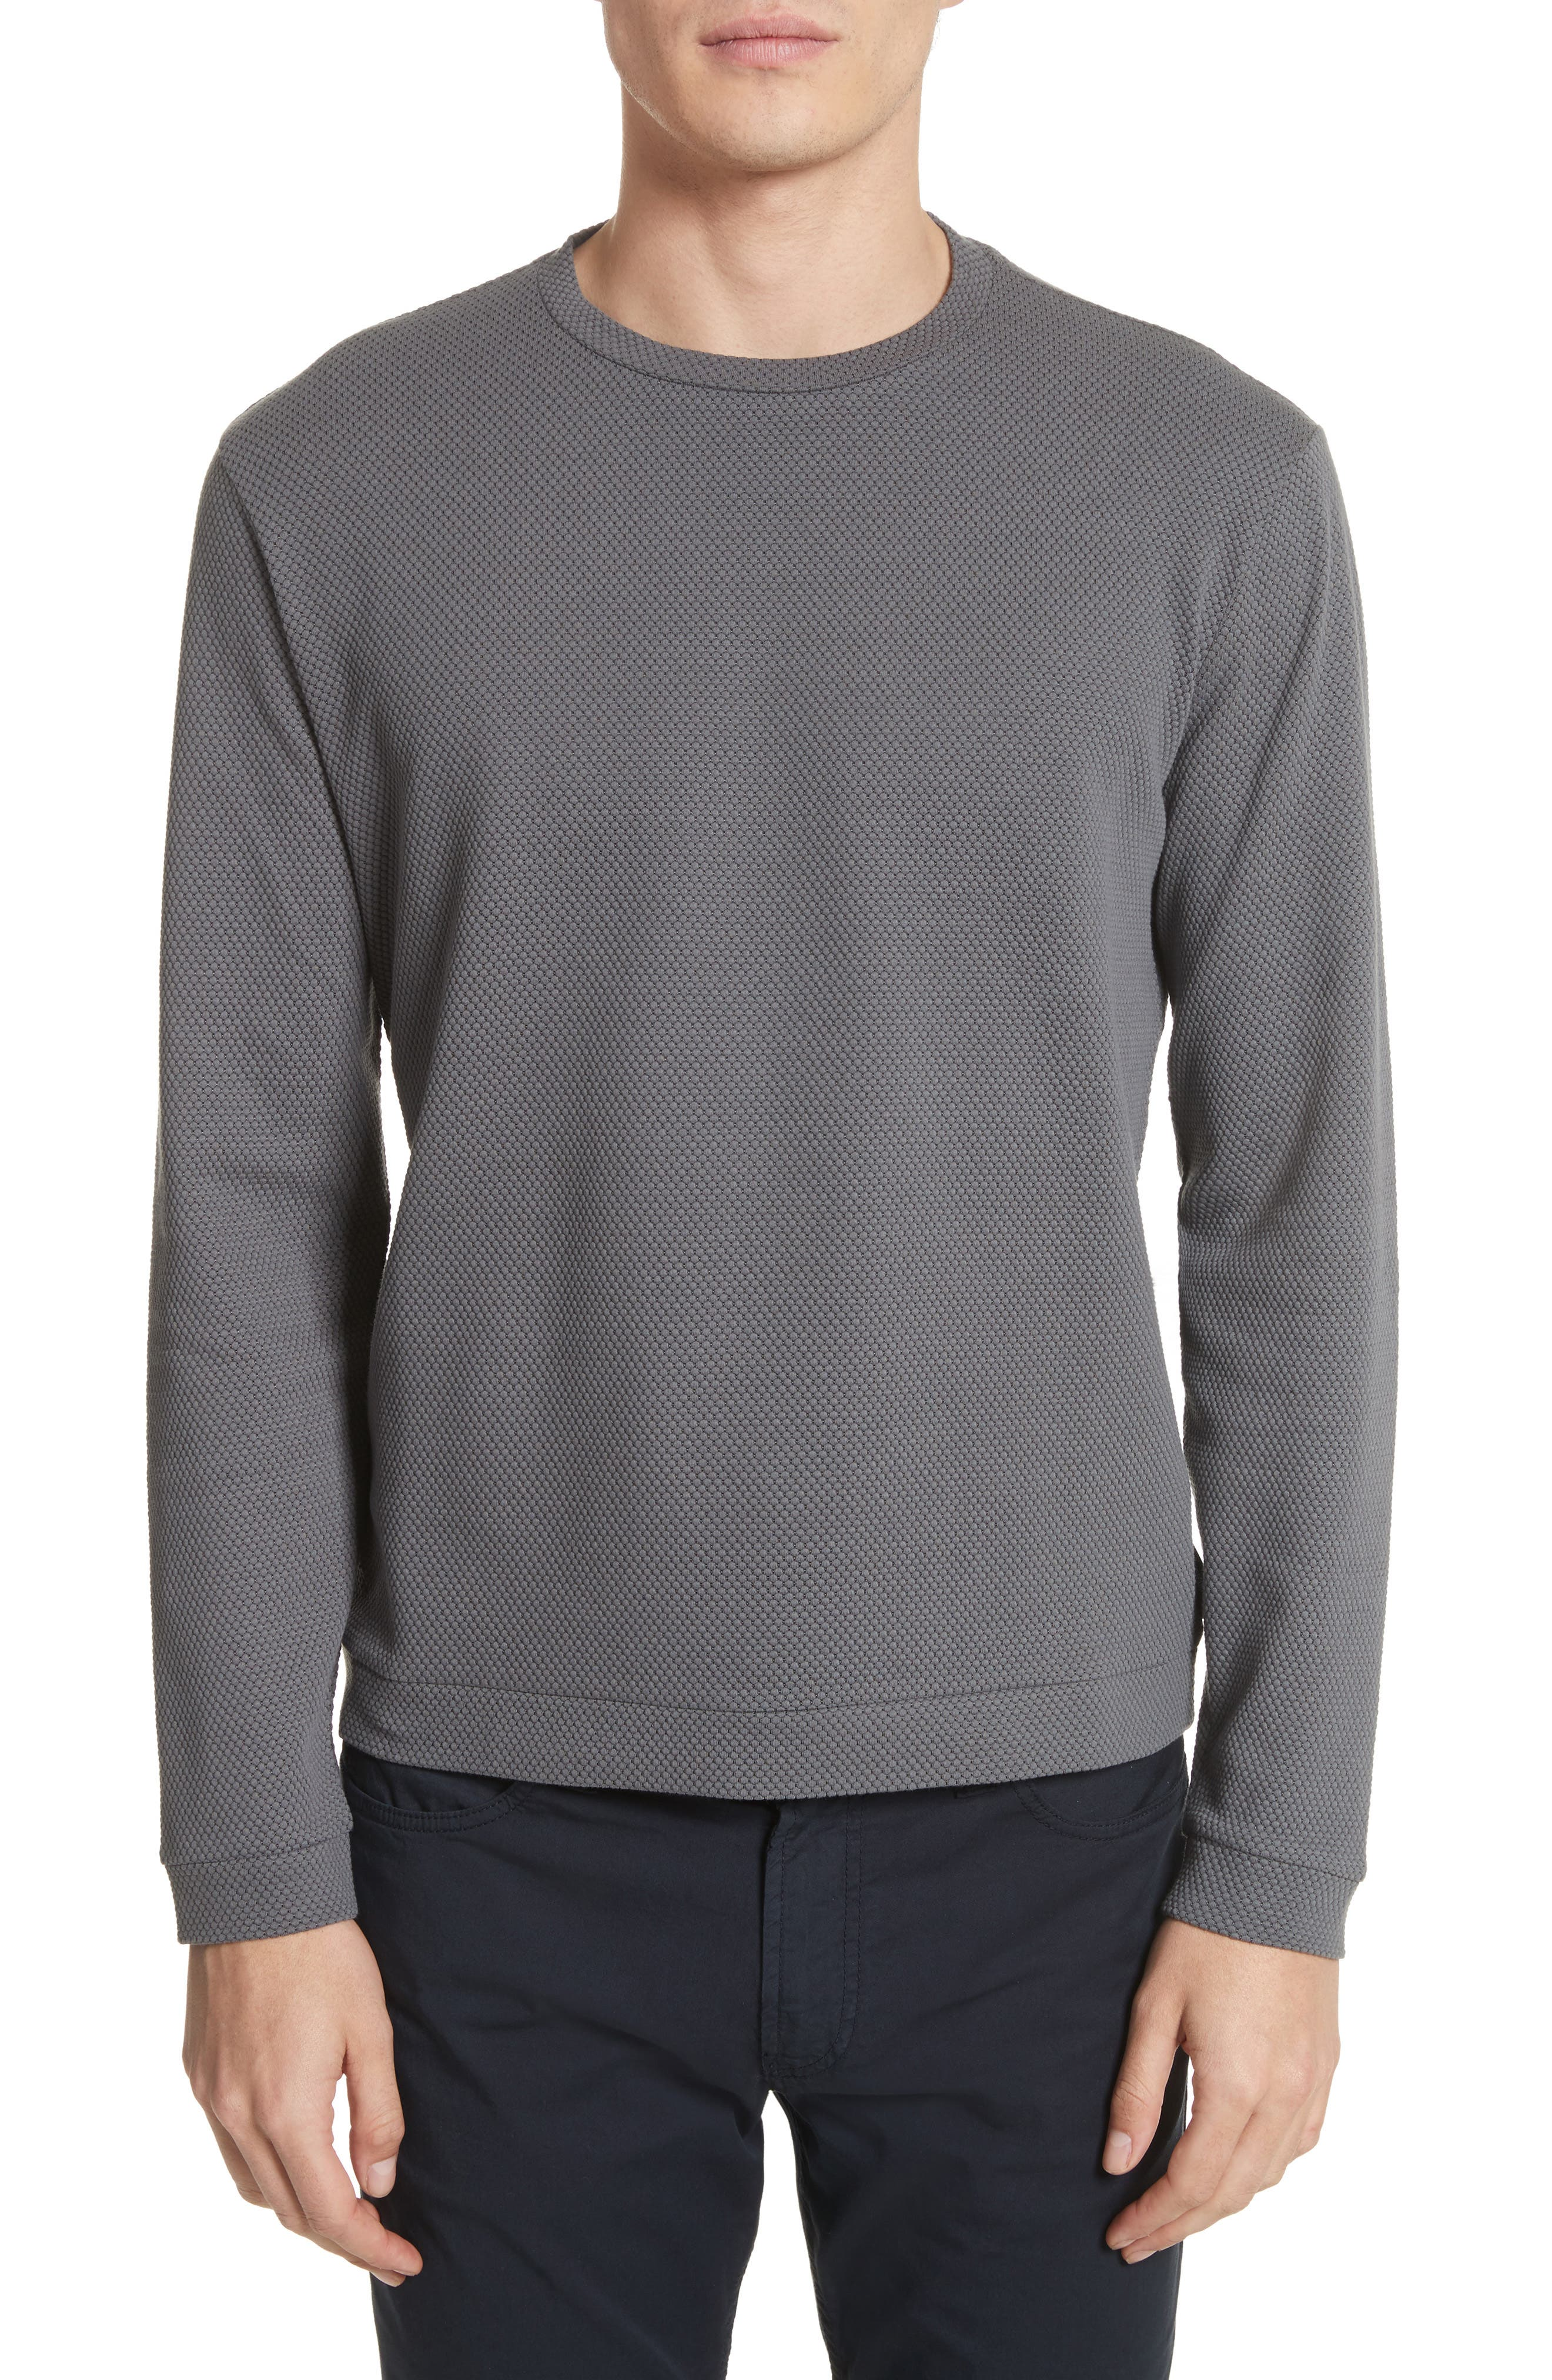 Main Image - Emporio Armani Honeycomb Jacquard Slim Fit T-Shirt